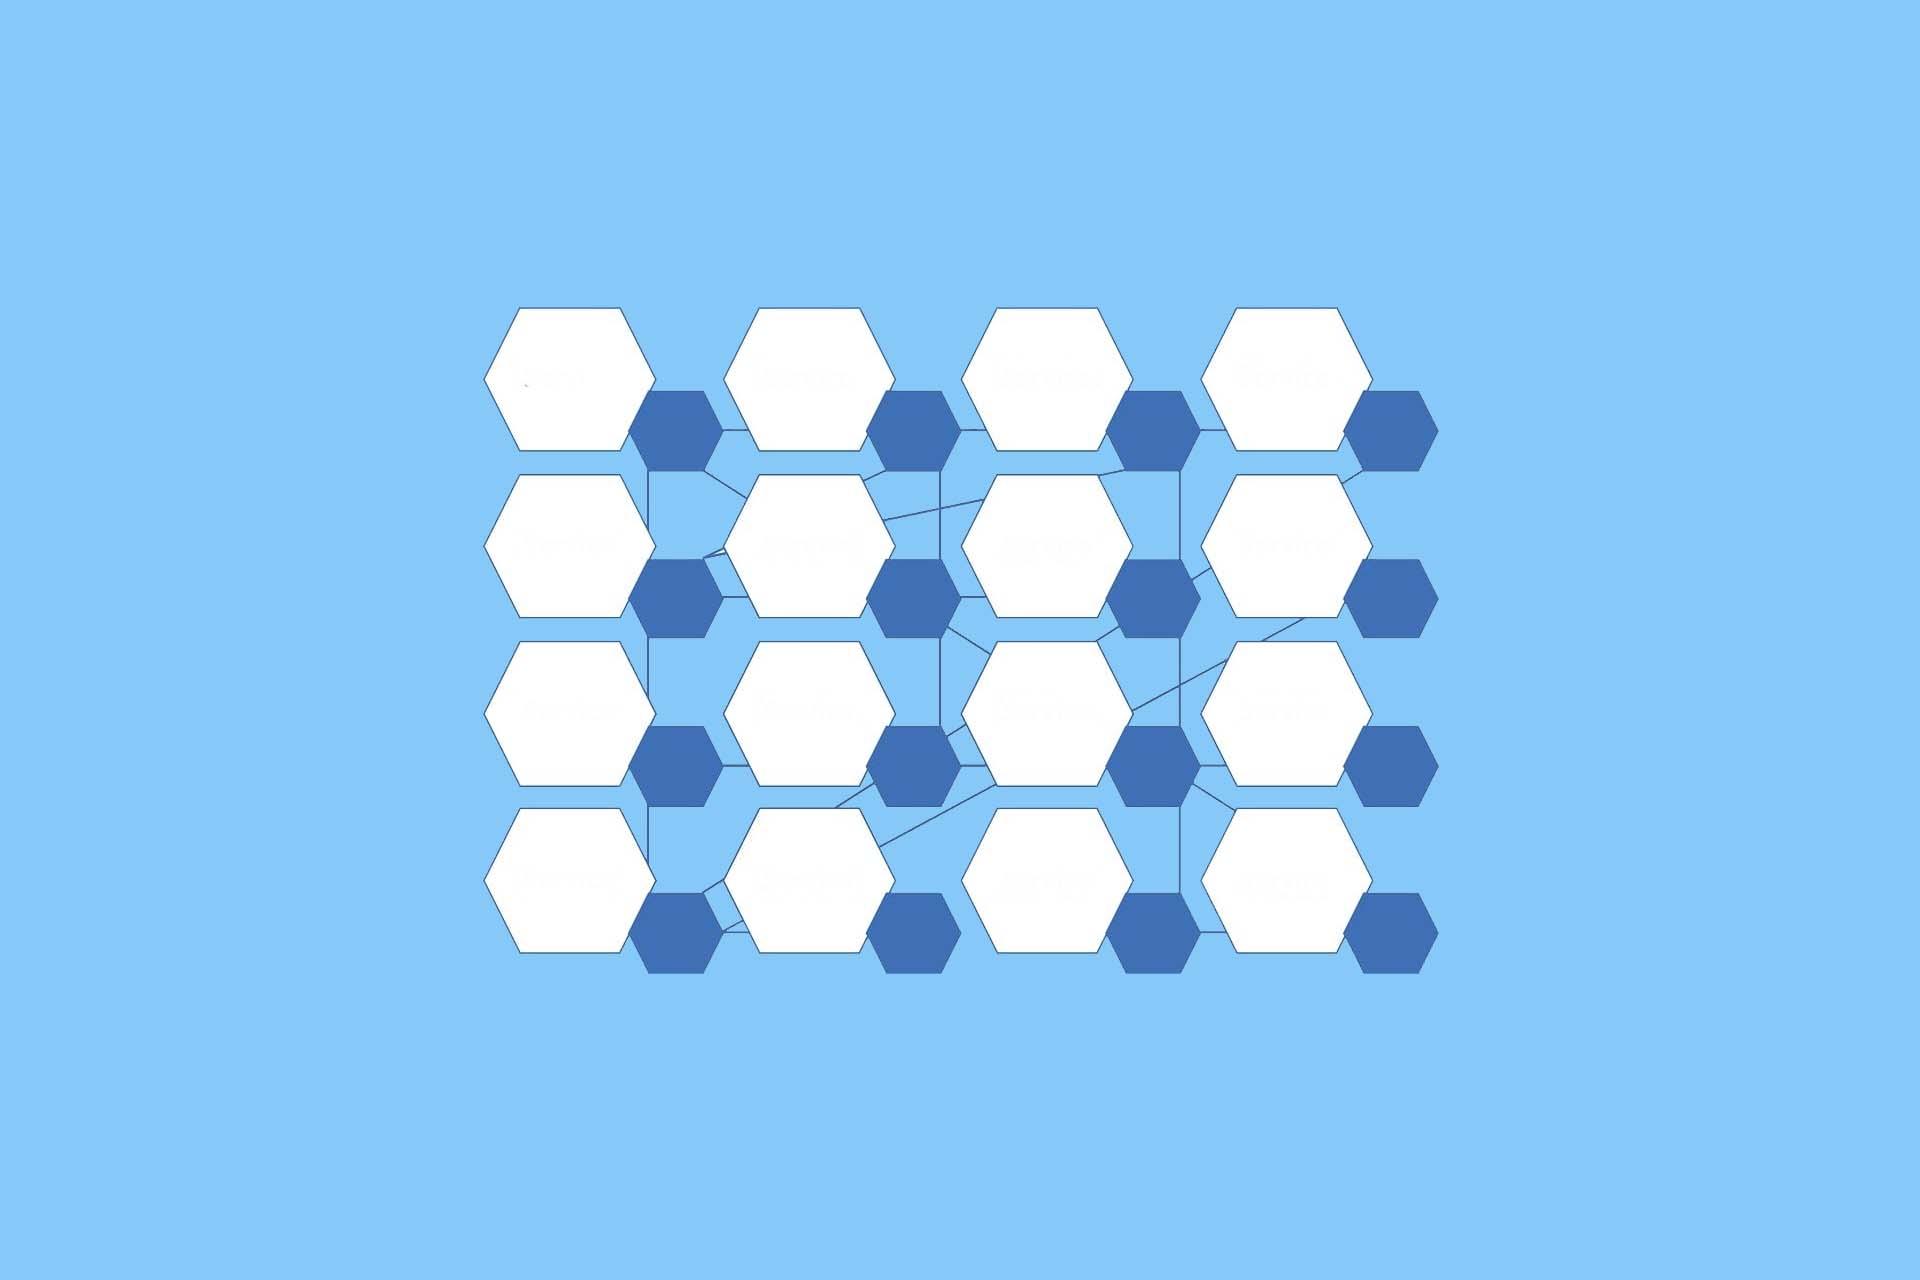 t2informatik Blog: Solving Cross-Cutting Concerns through patterns